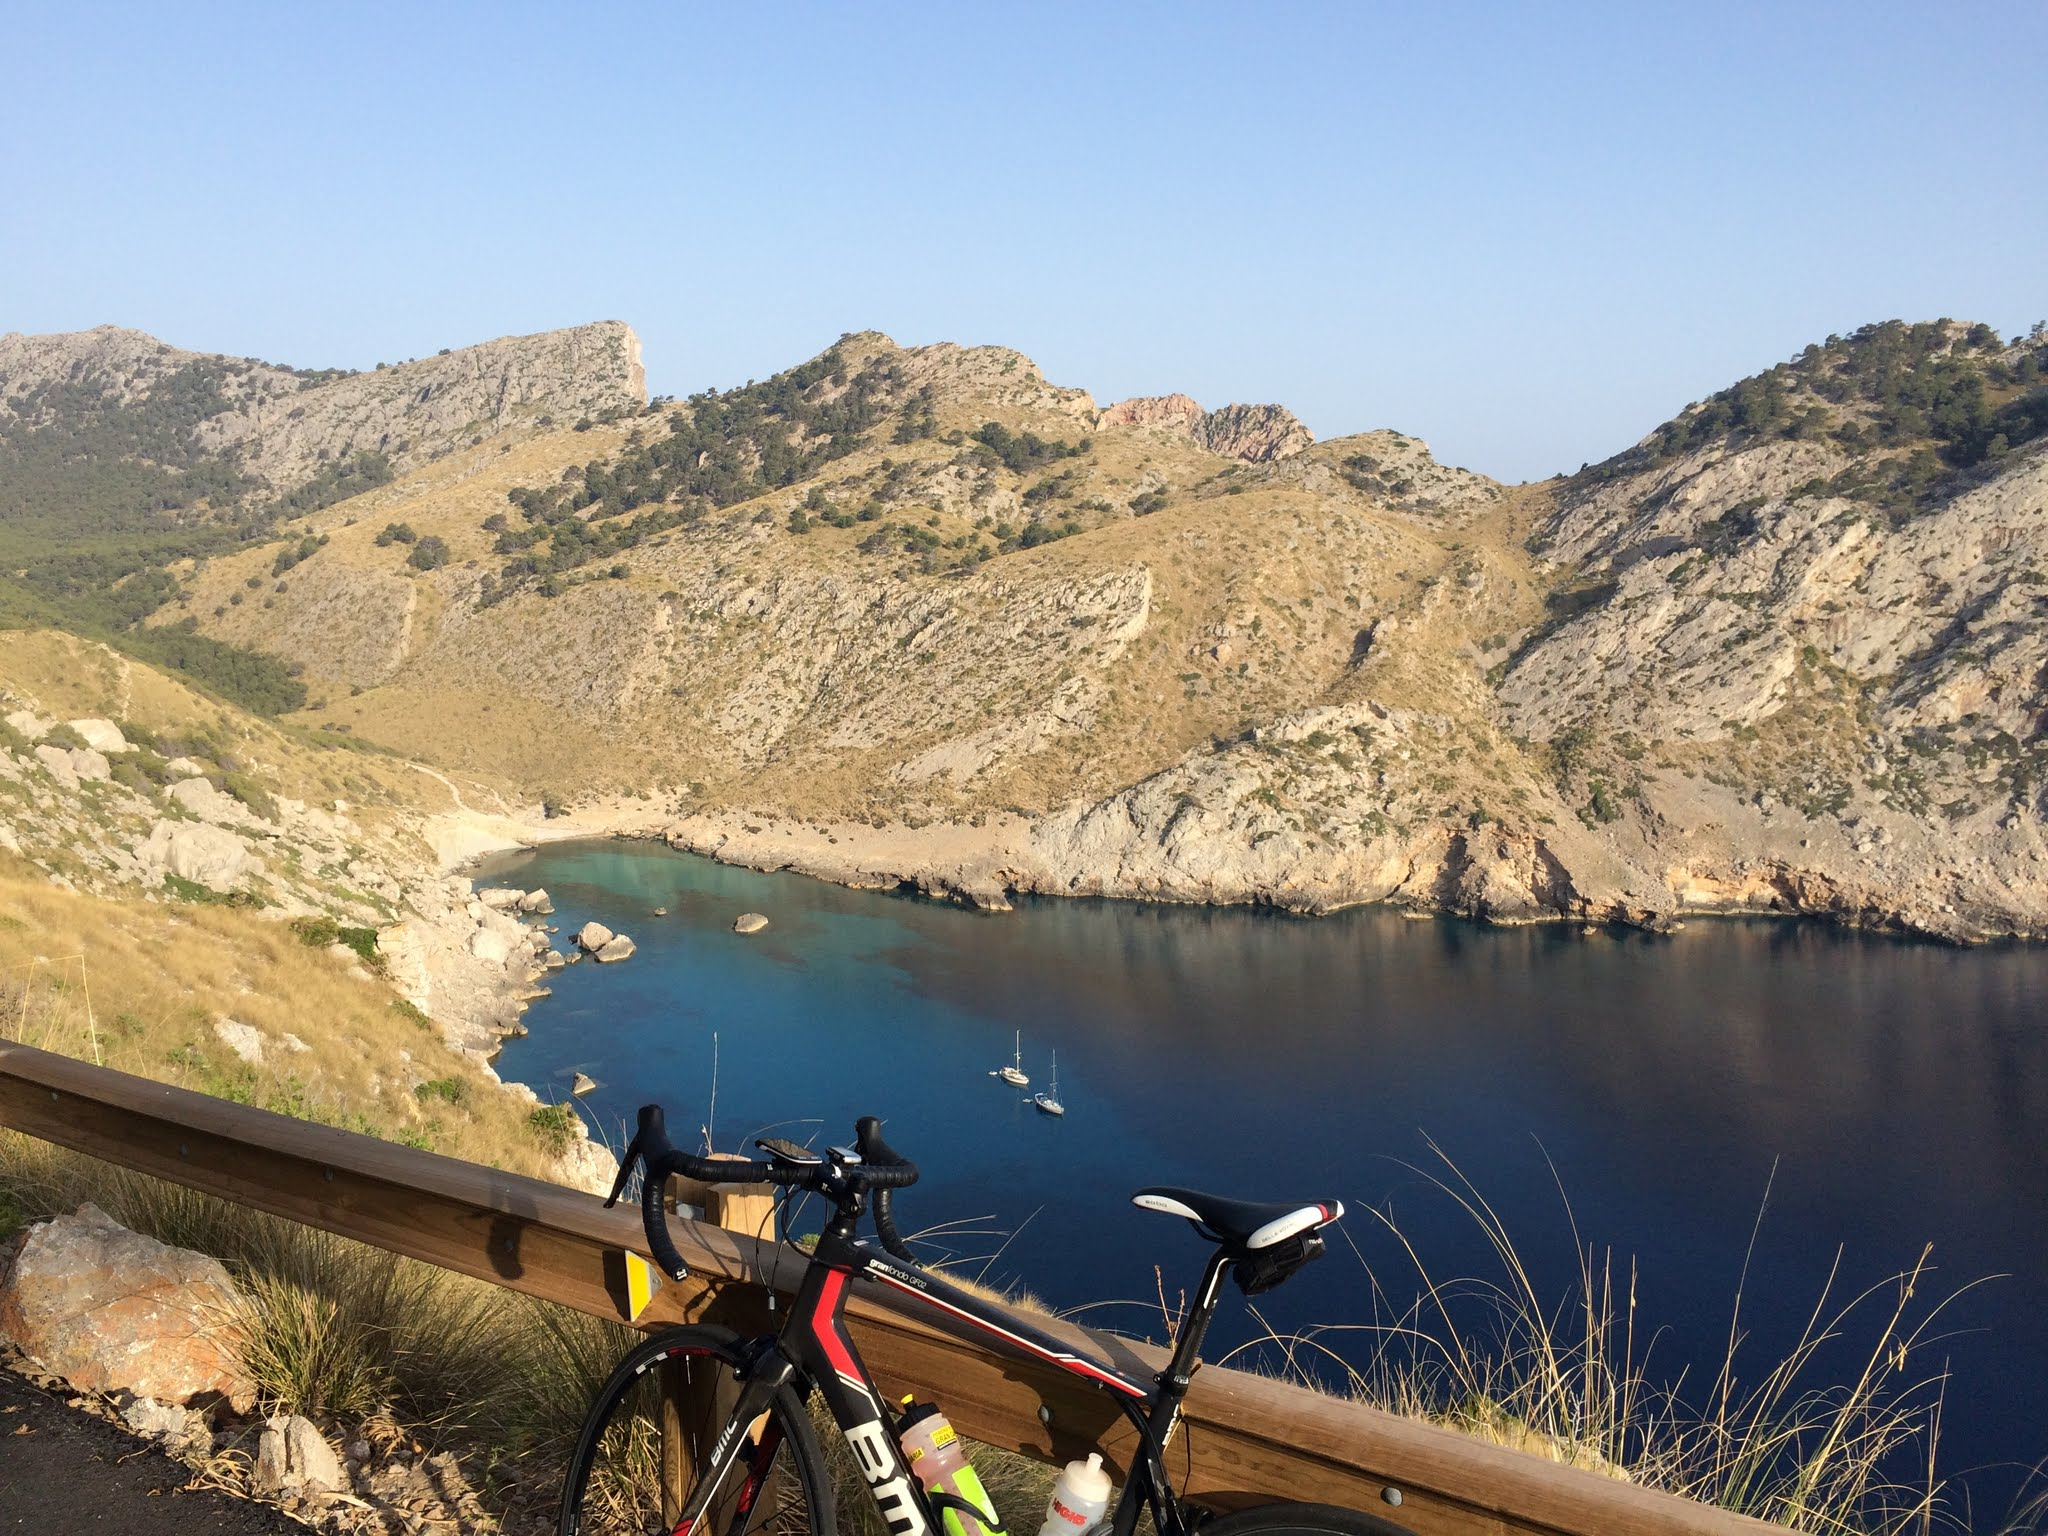 Palma – pretty mountain towns amid striking scenery